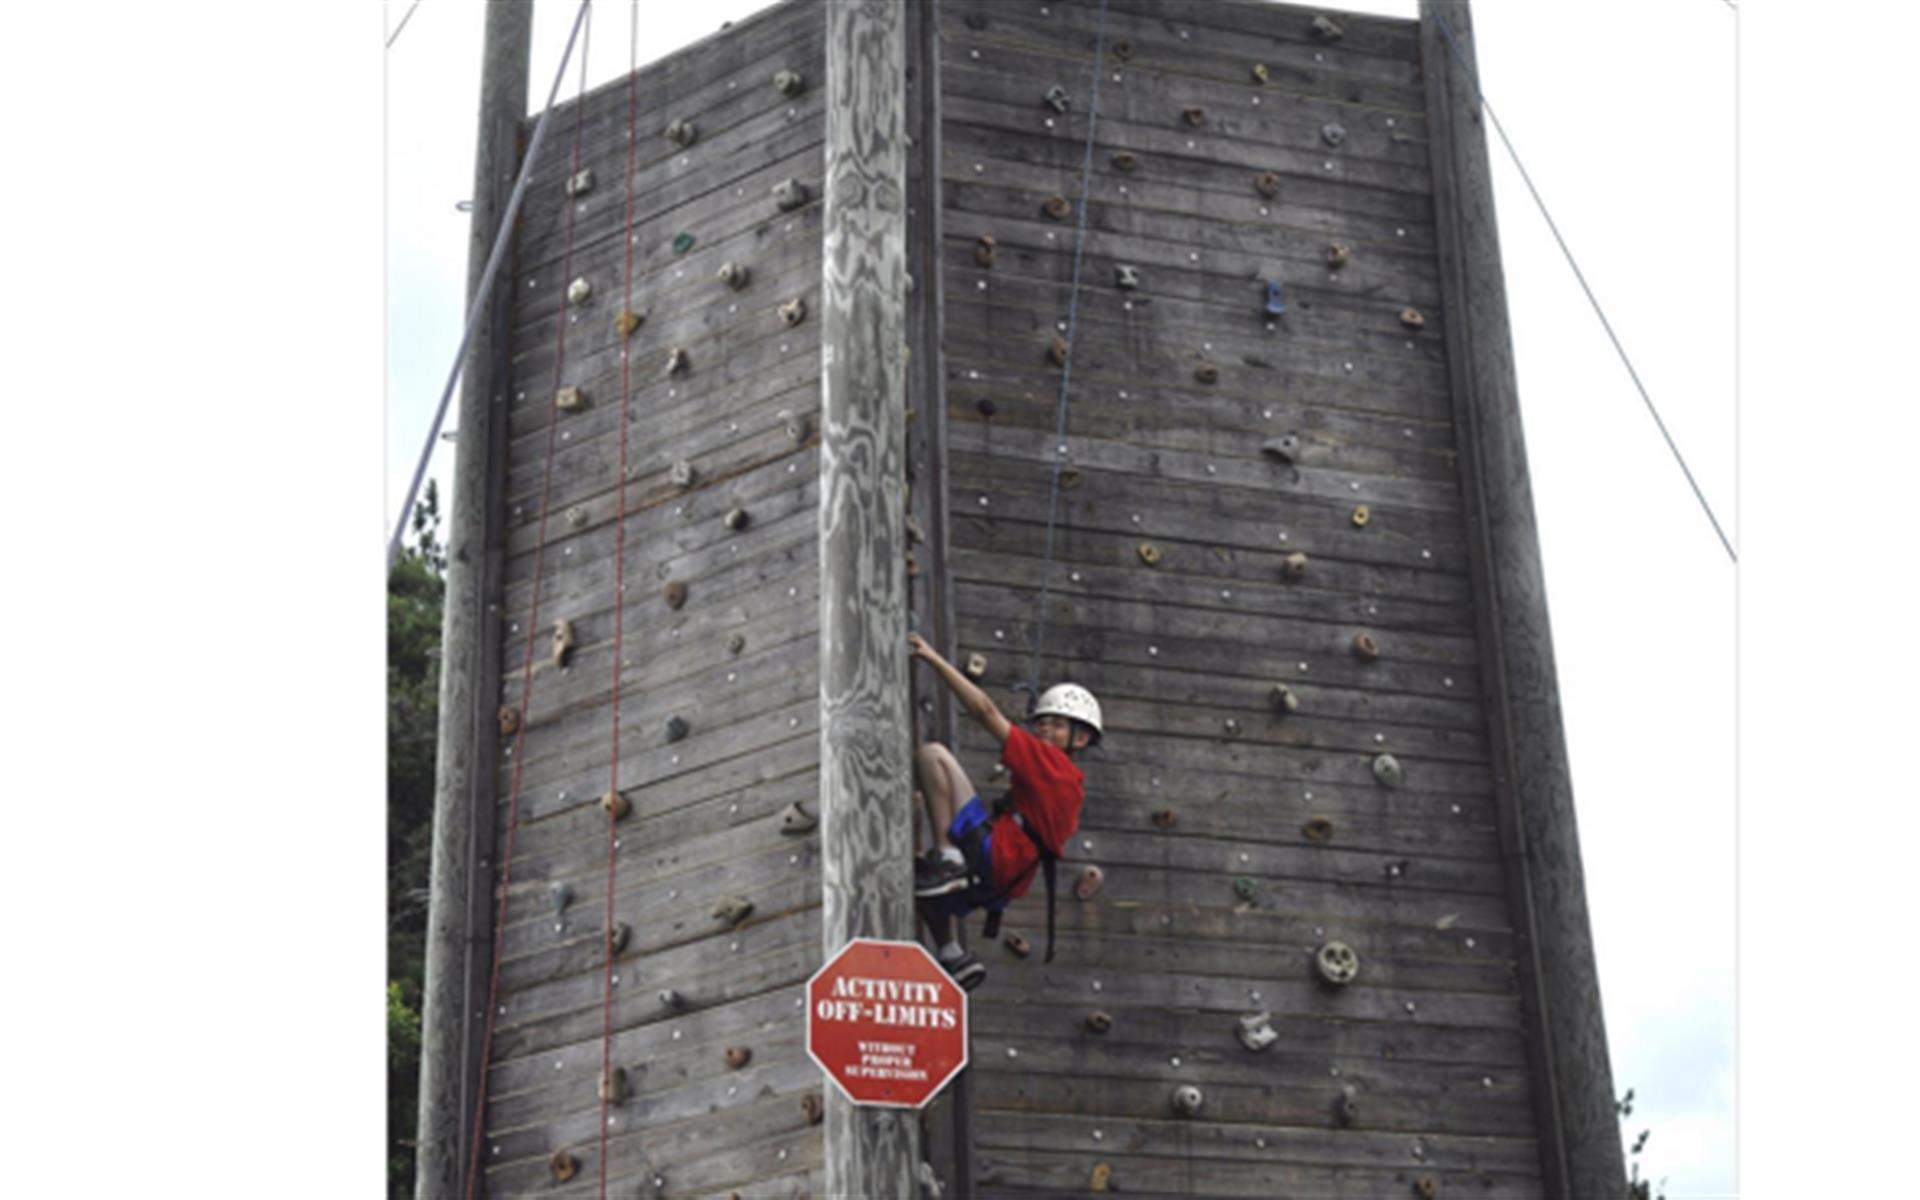 YMCA Camp Weona - Upstate New York - Outdoor Recreation Center